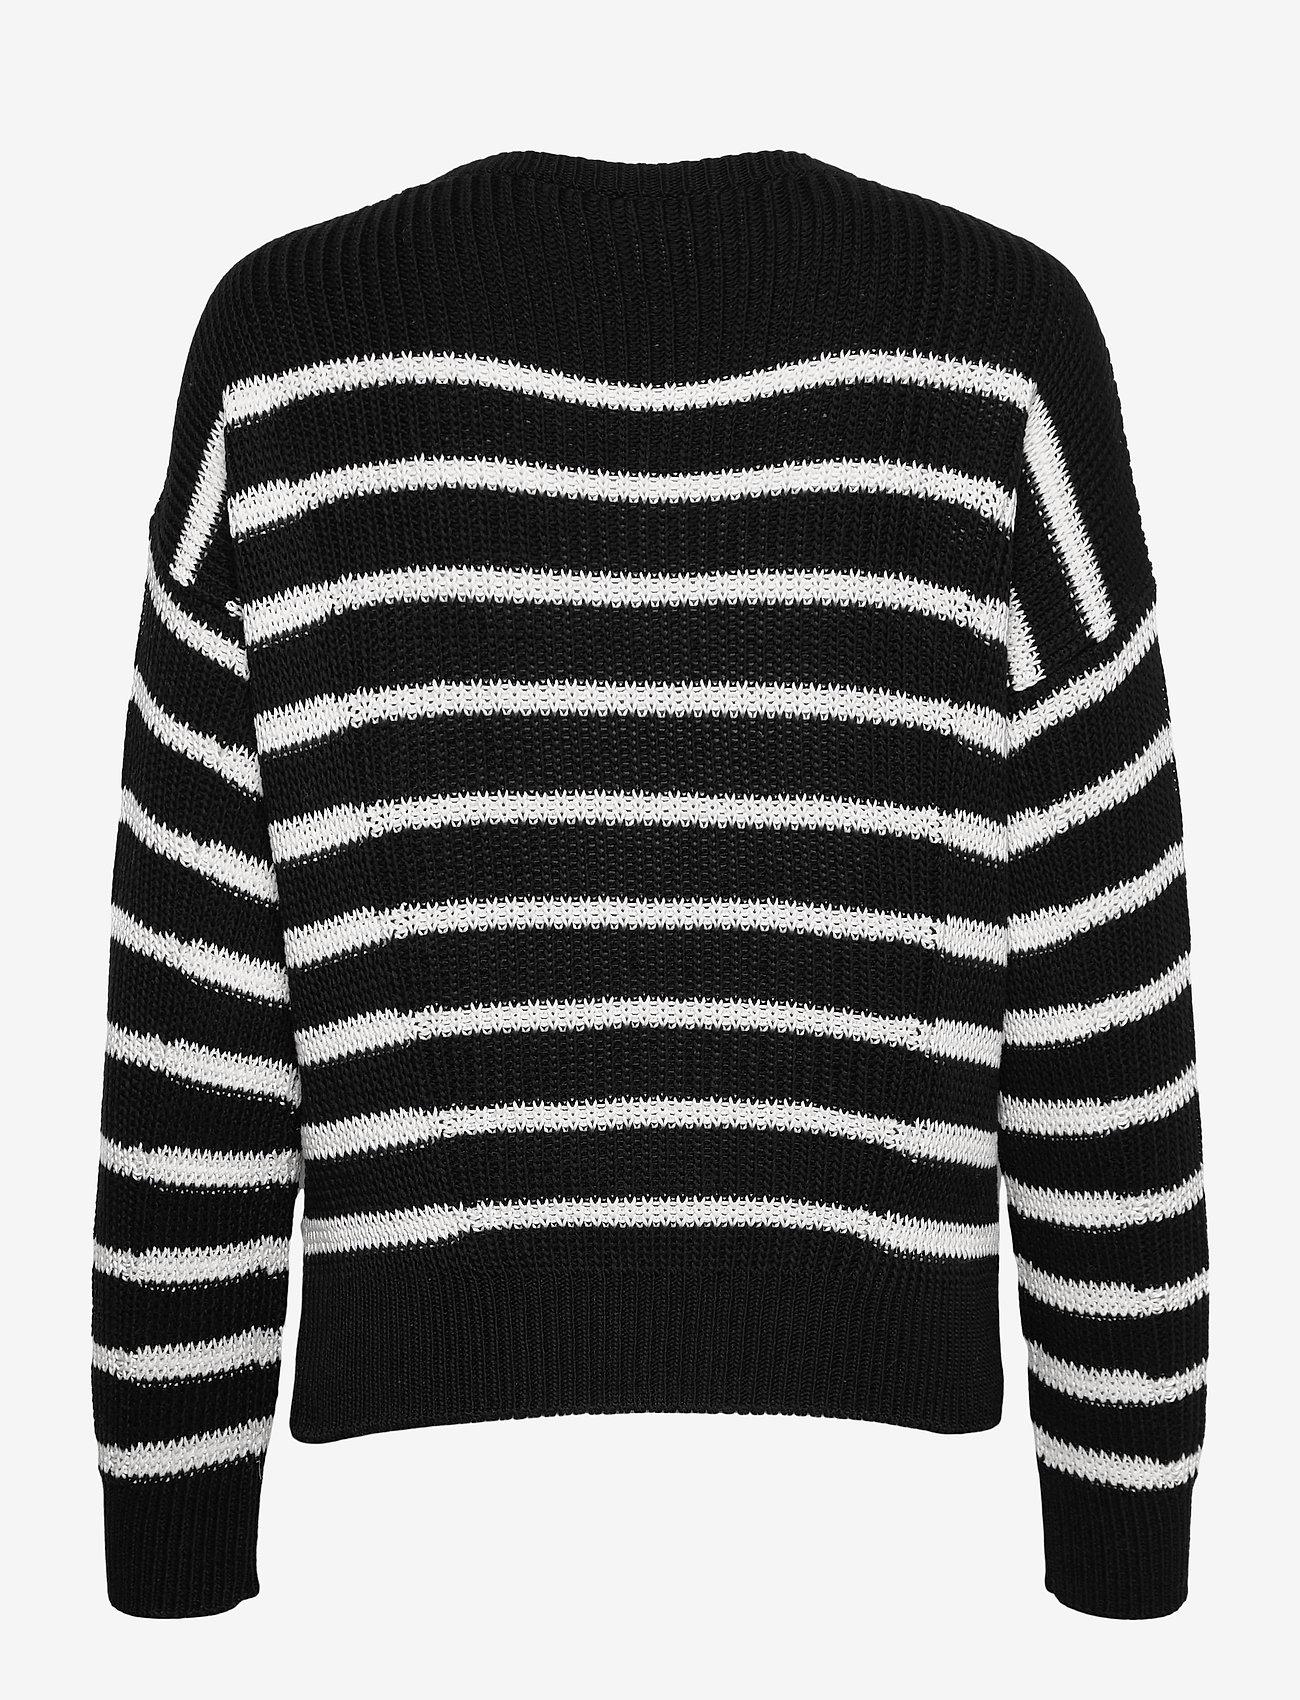 Max&Co. - COTTURA - truien - black pattern - 1